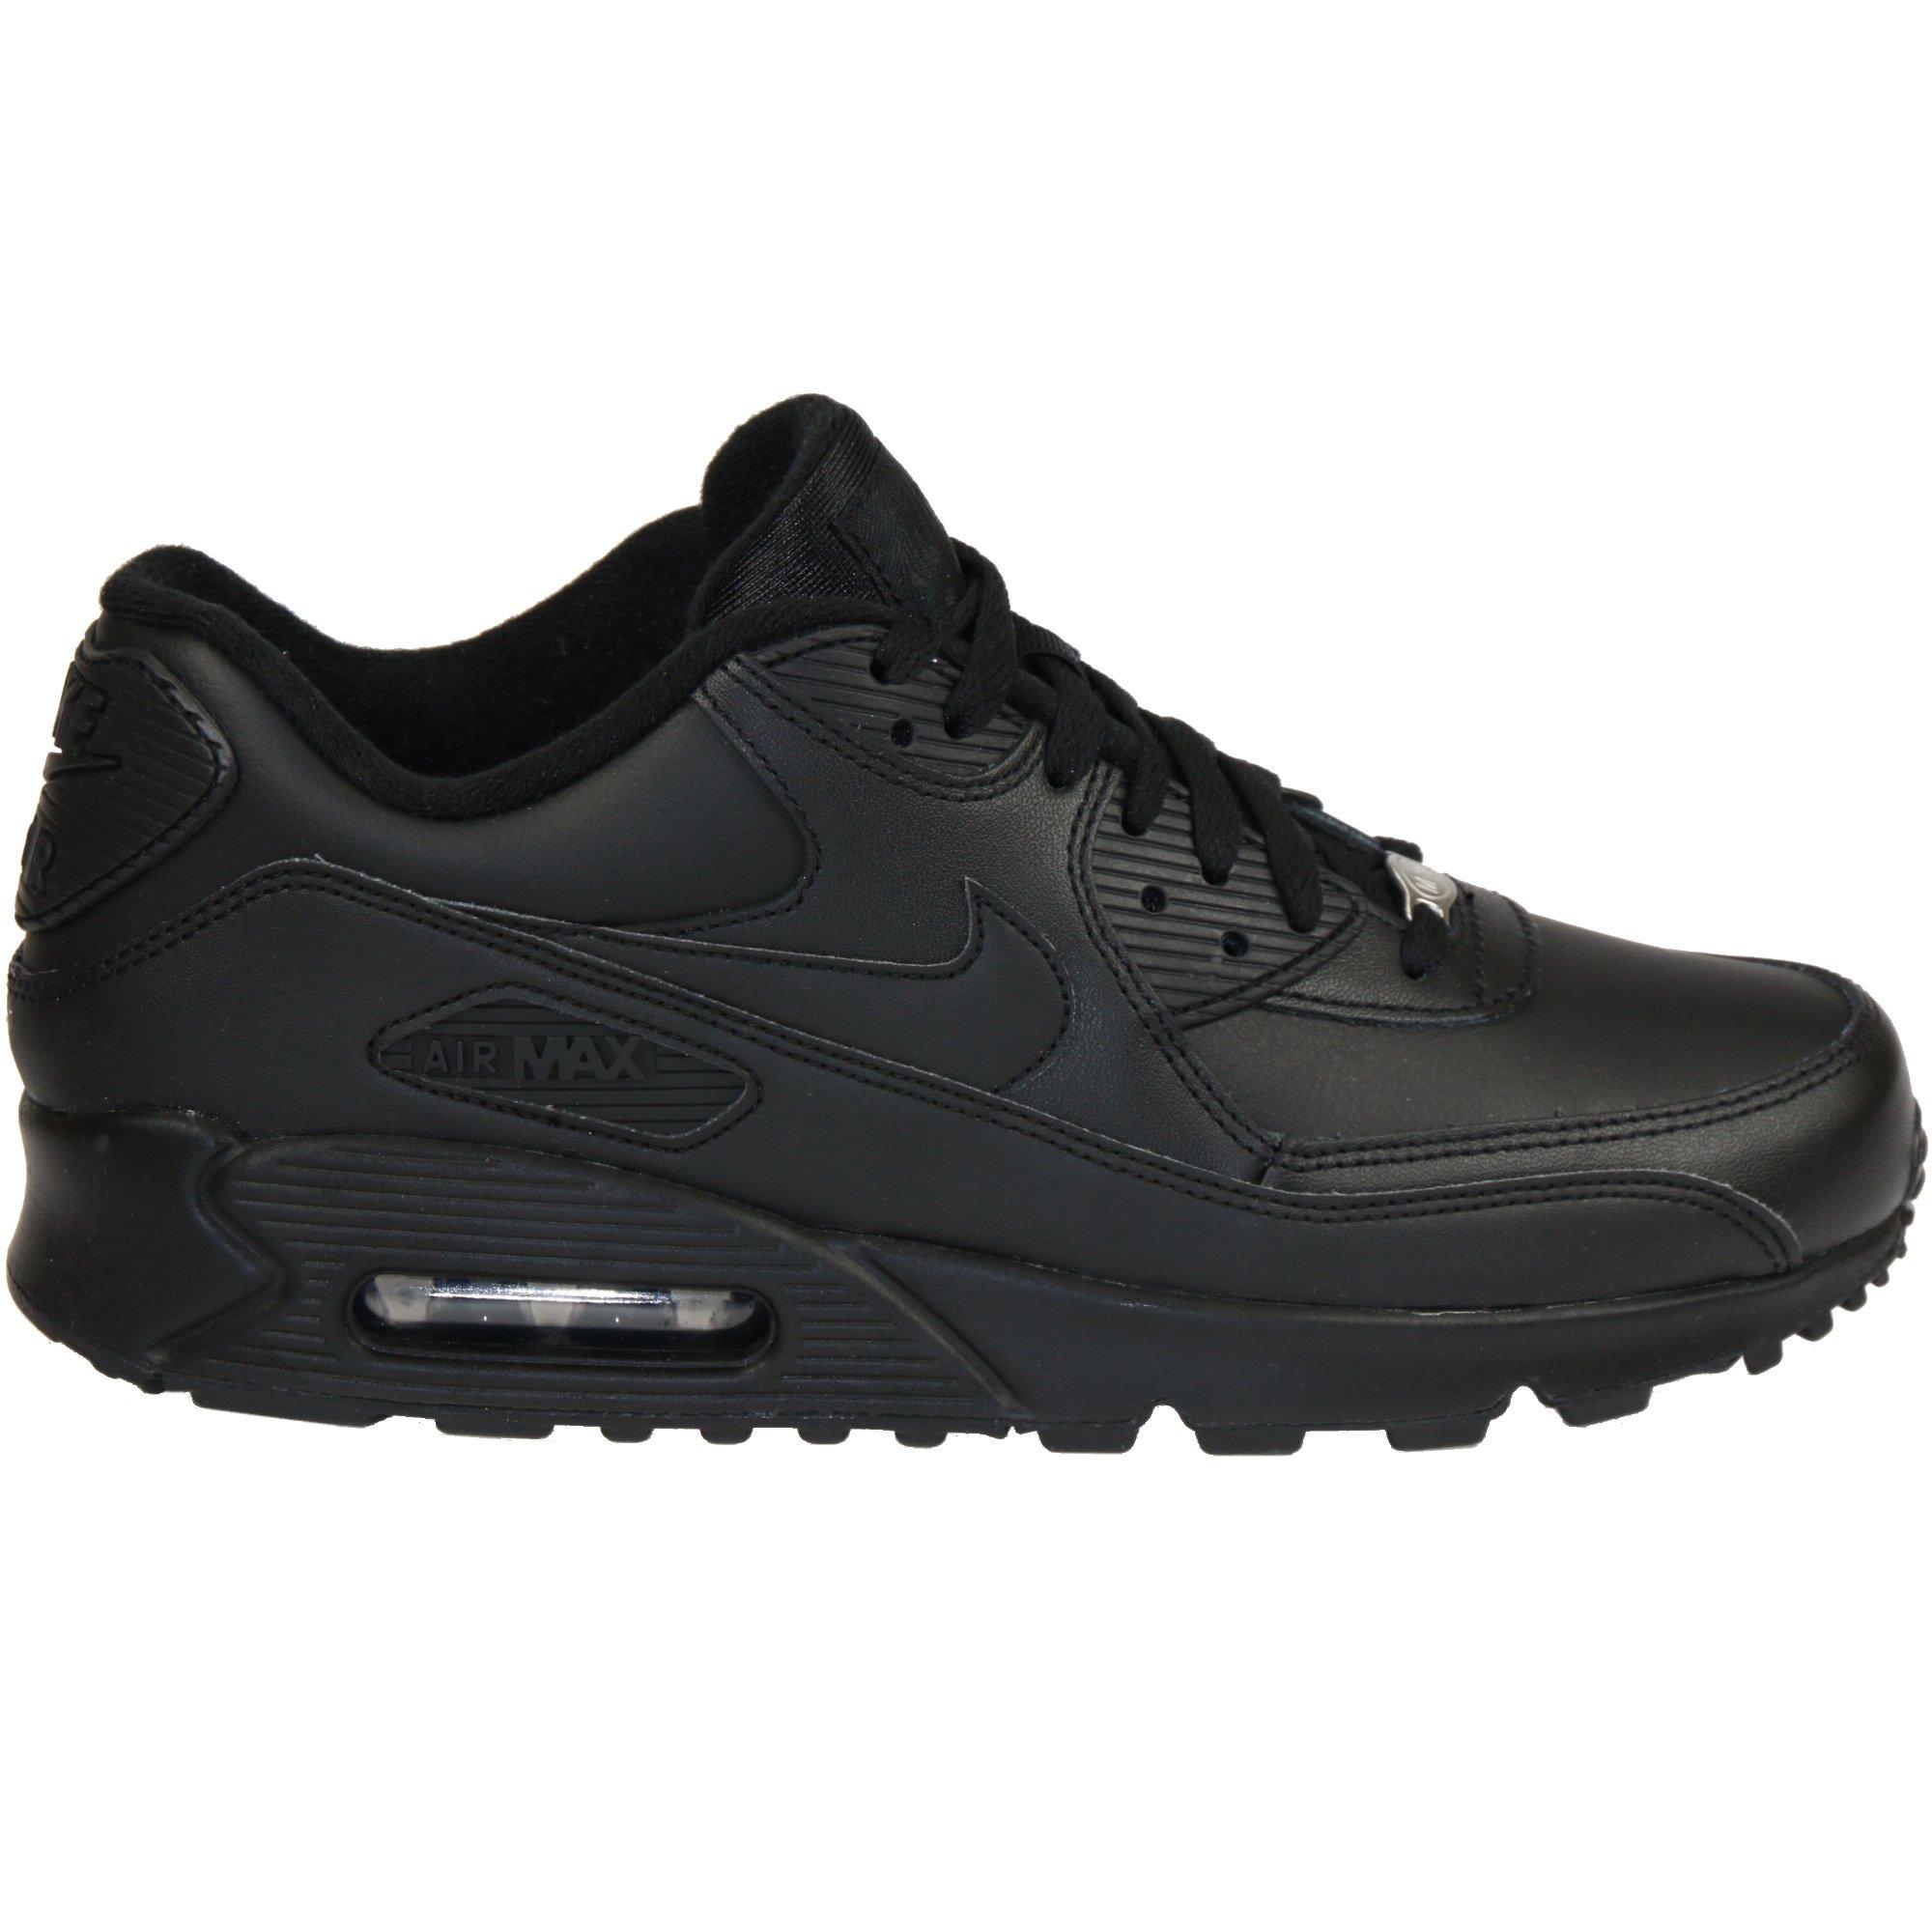 buy online e3774 f3230 Galleon - Nike Men s Air Max 90 Black 302519-001 (Size  7.5)